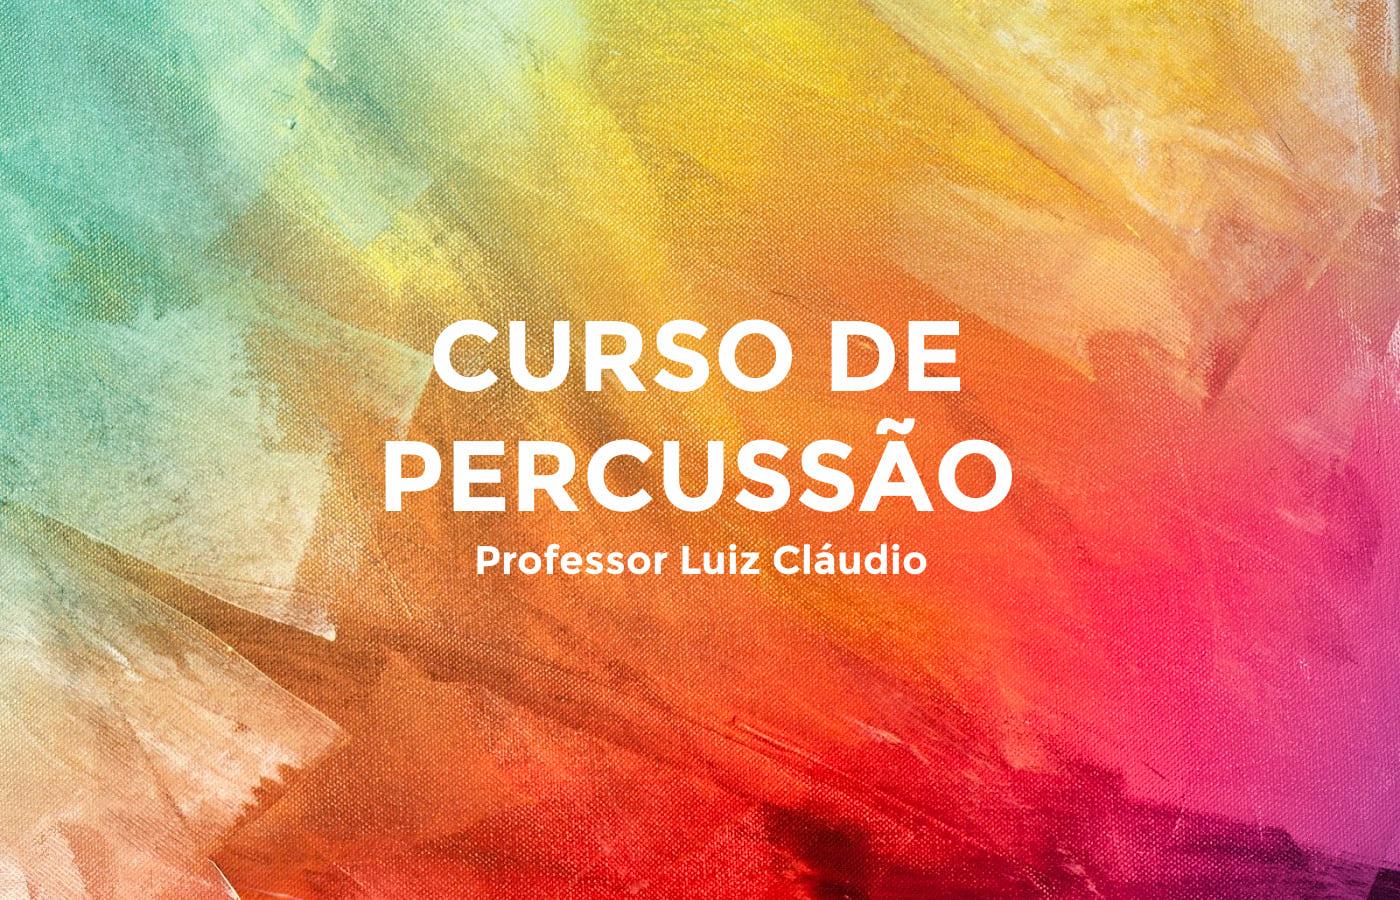 Curso de PercussãoBertioga Luiz Claudio